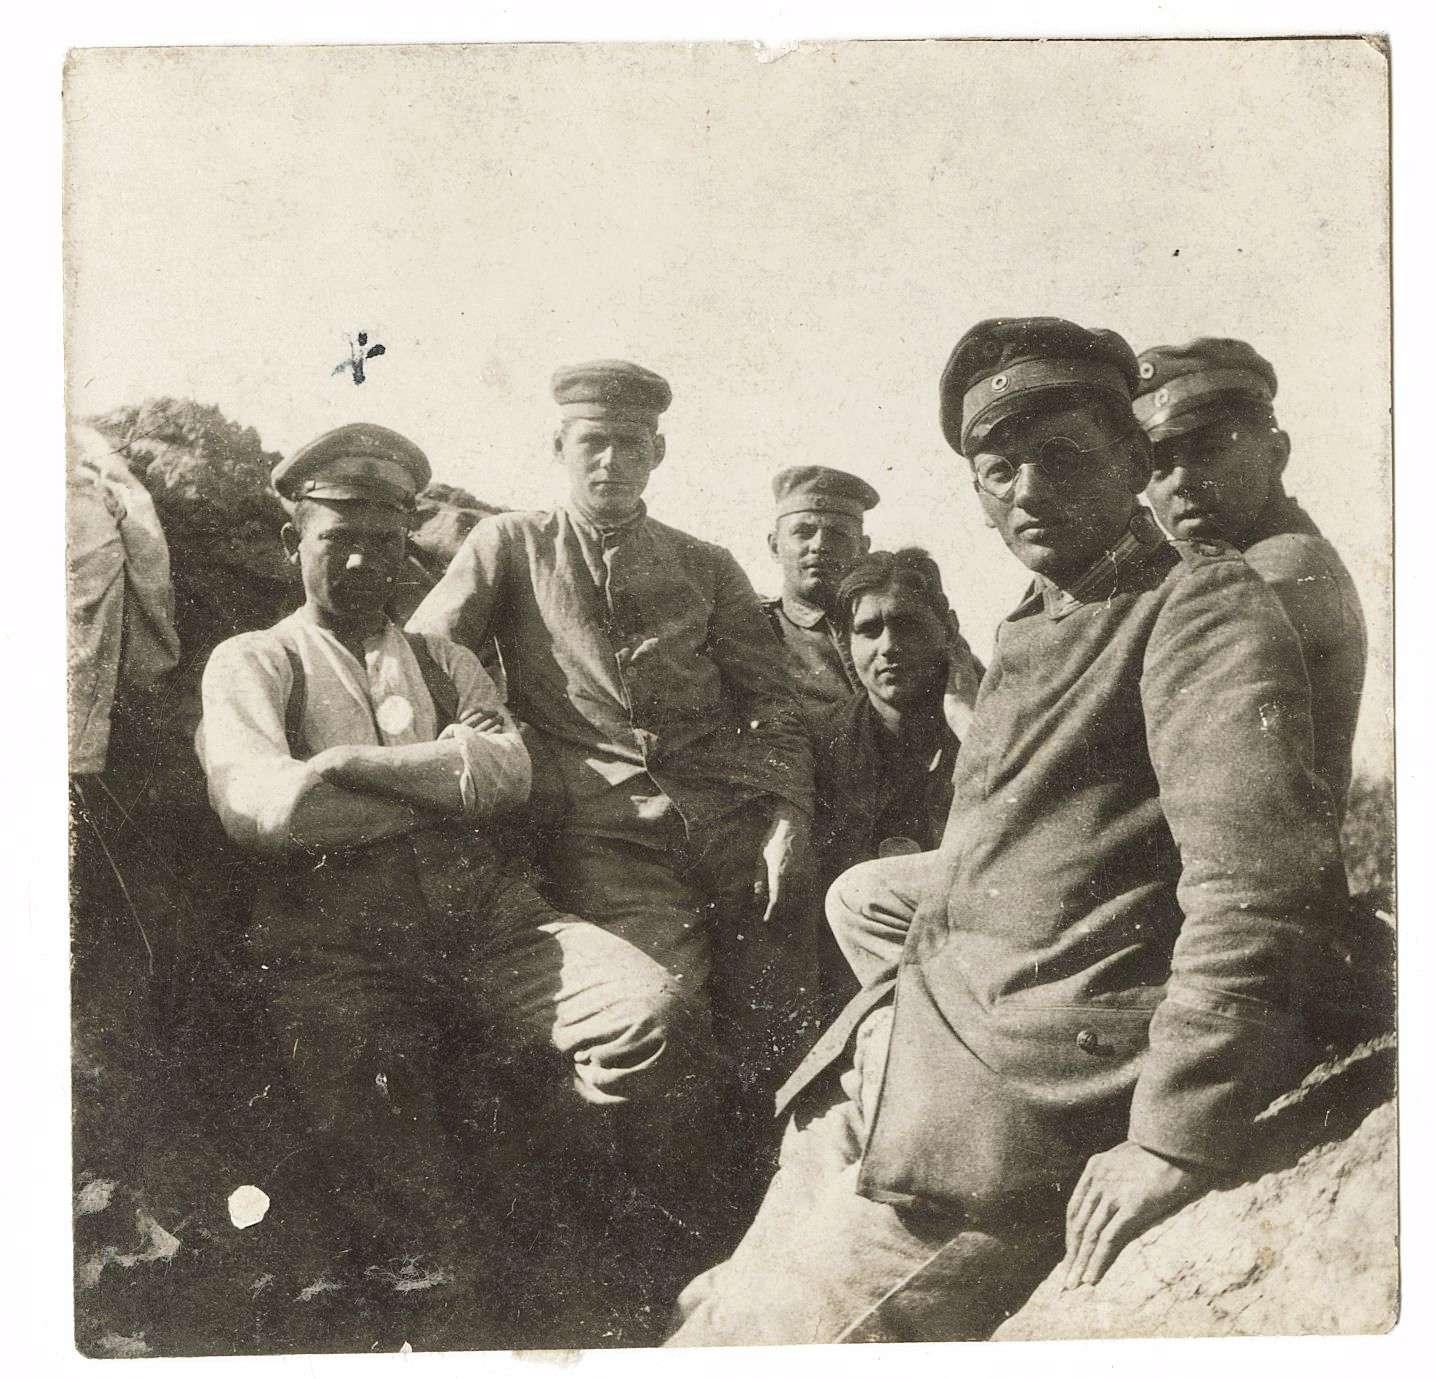 Hudelmaier, Anton, Bild 3